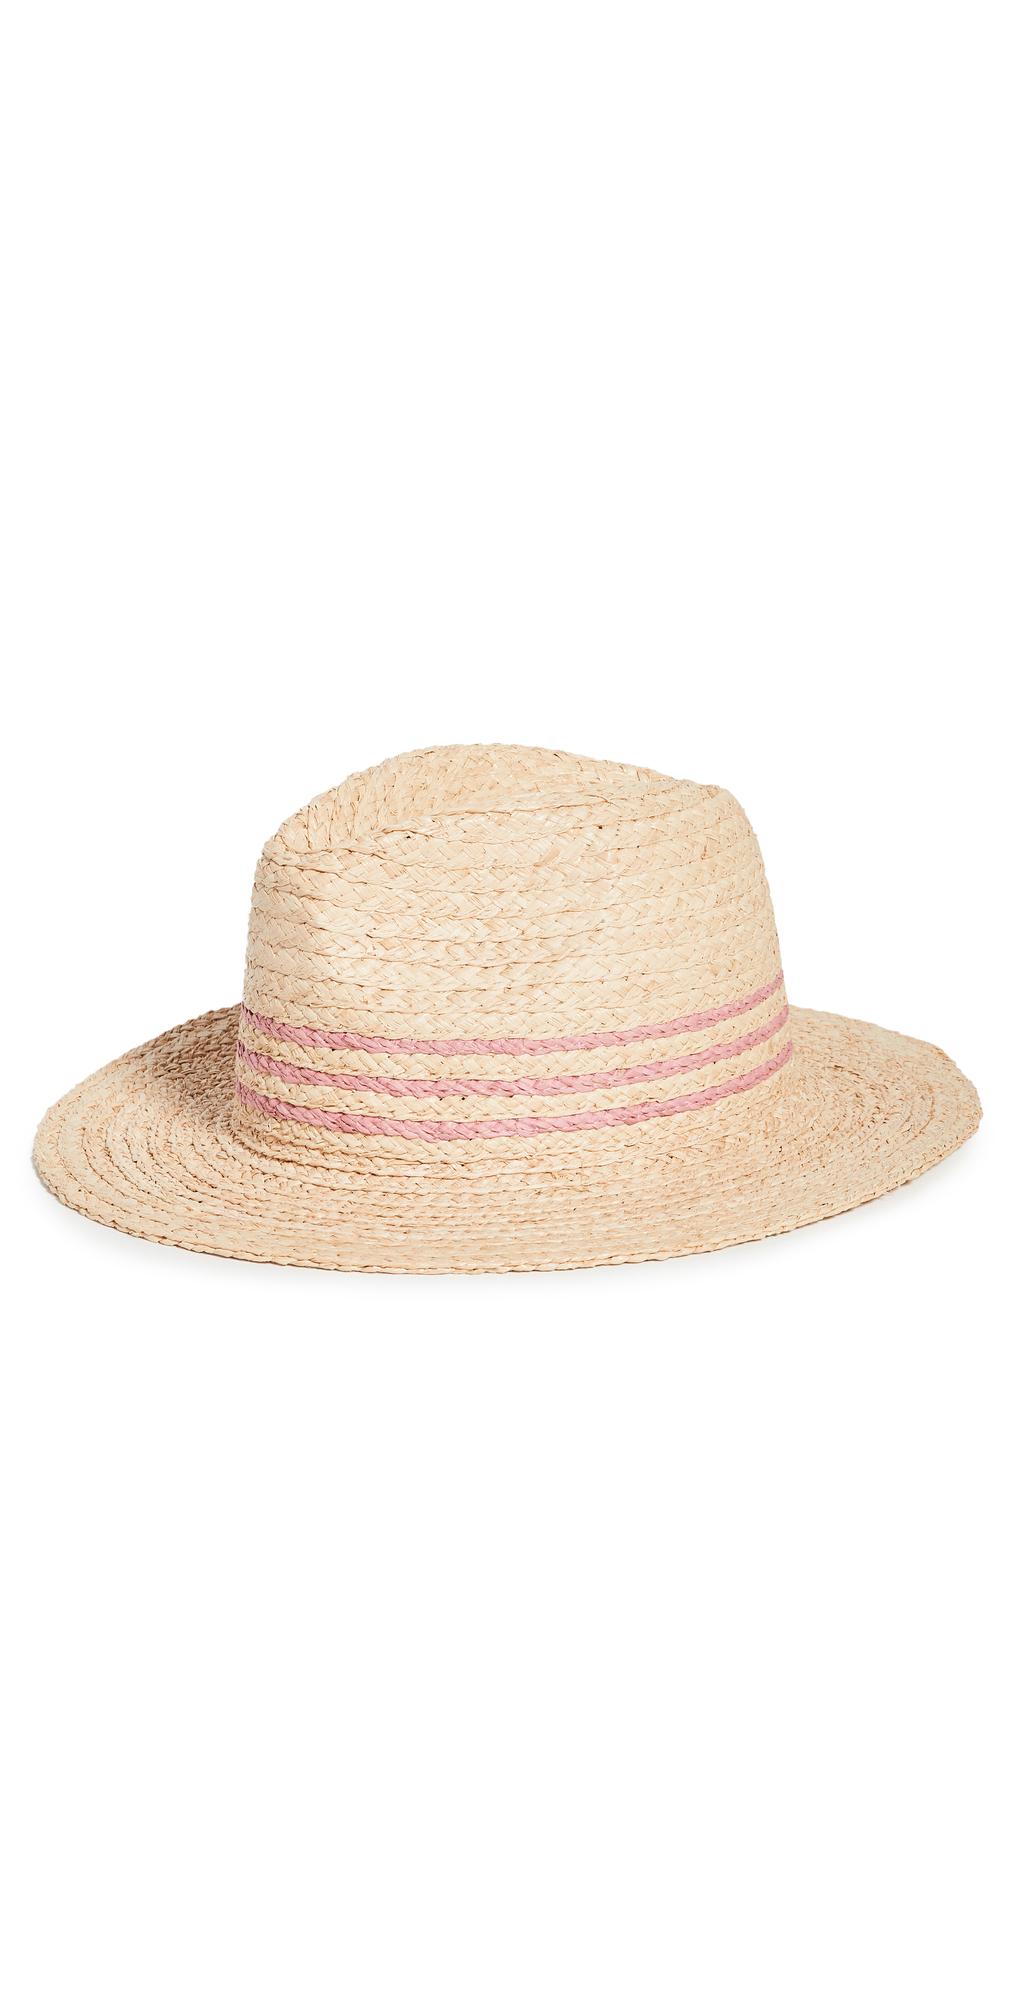 Maise Inset Rancher Hat